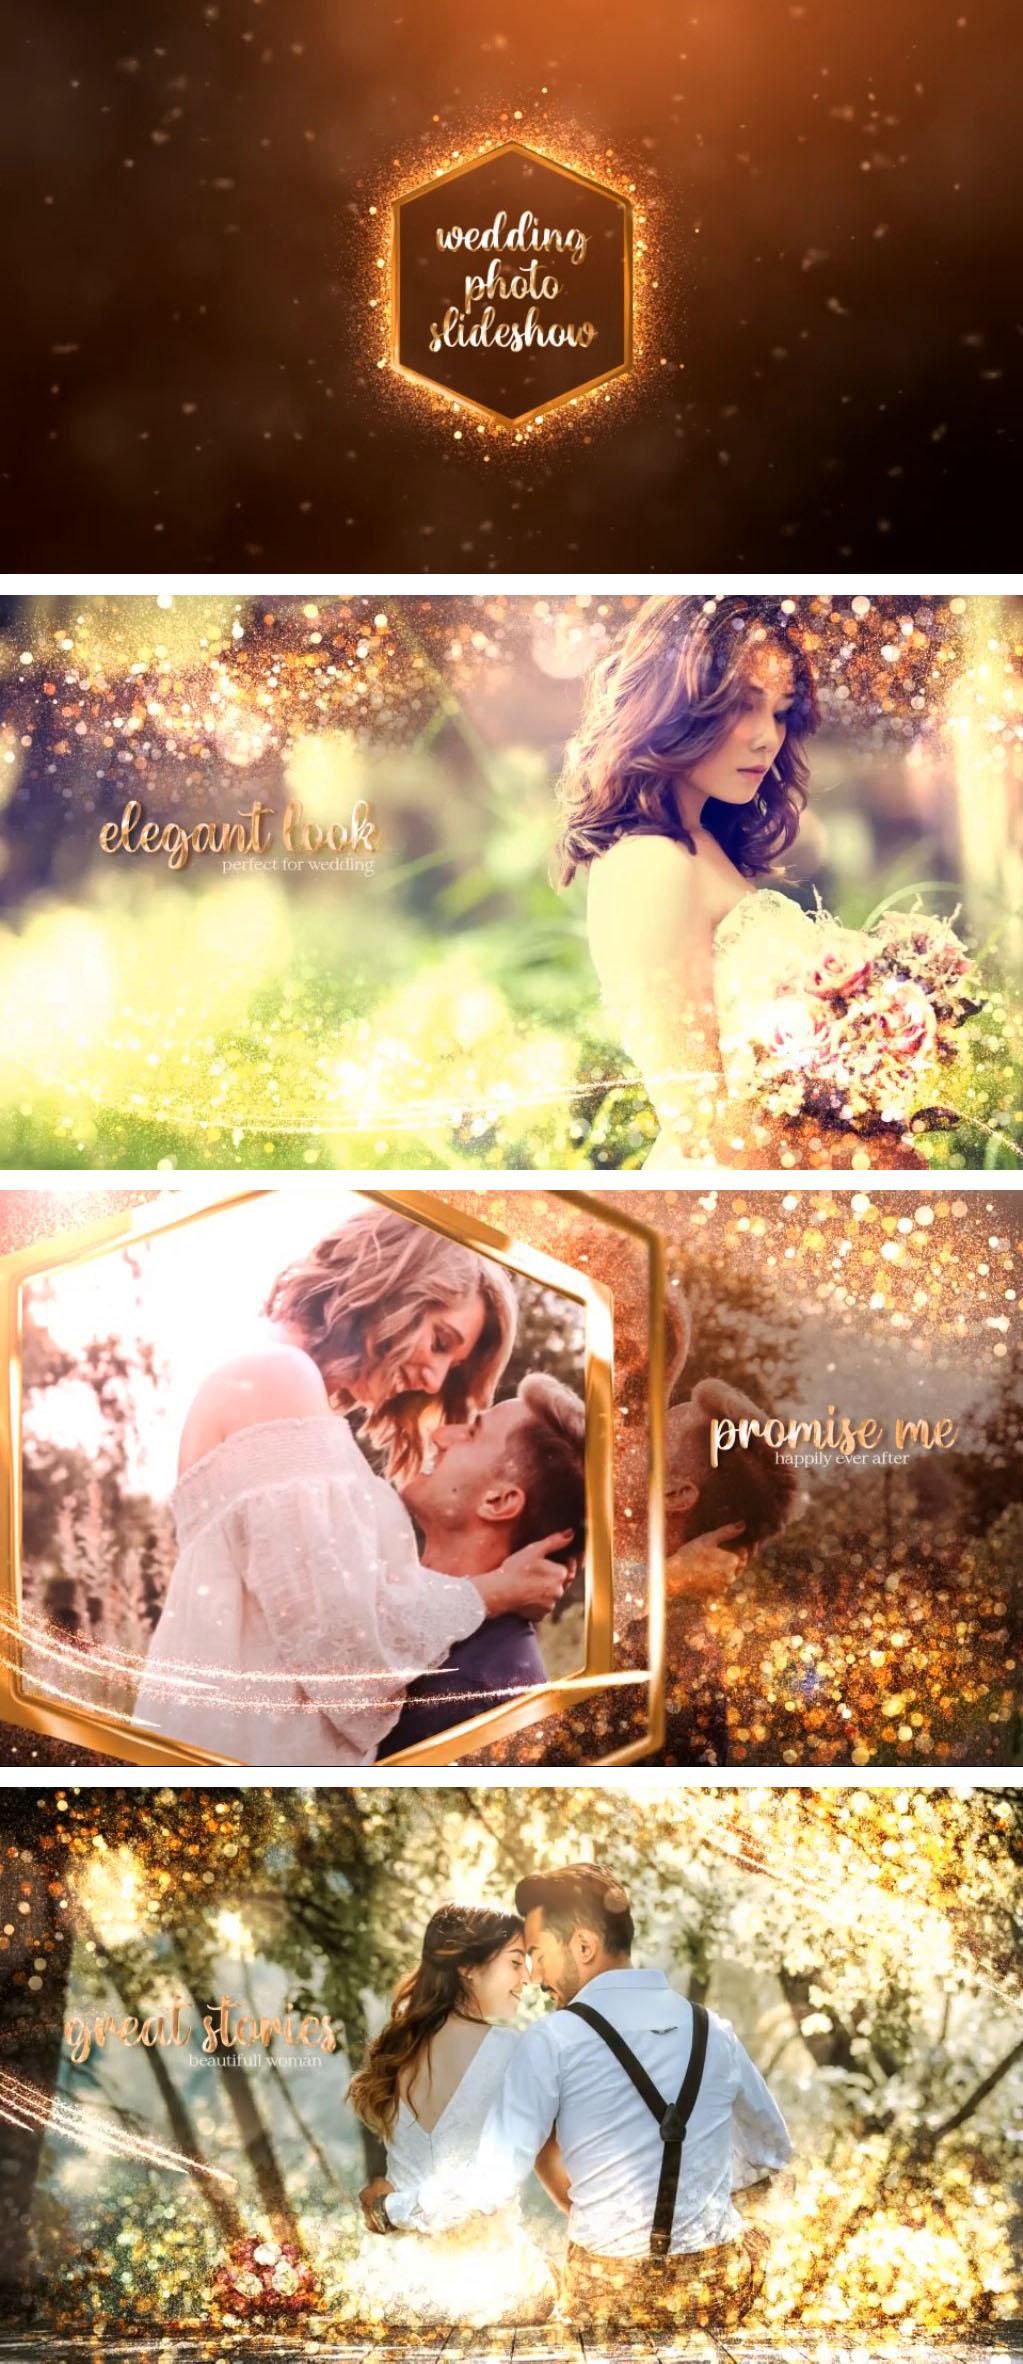 Gold Wedding Slideshow